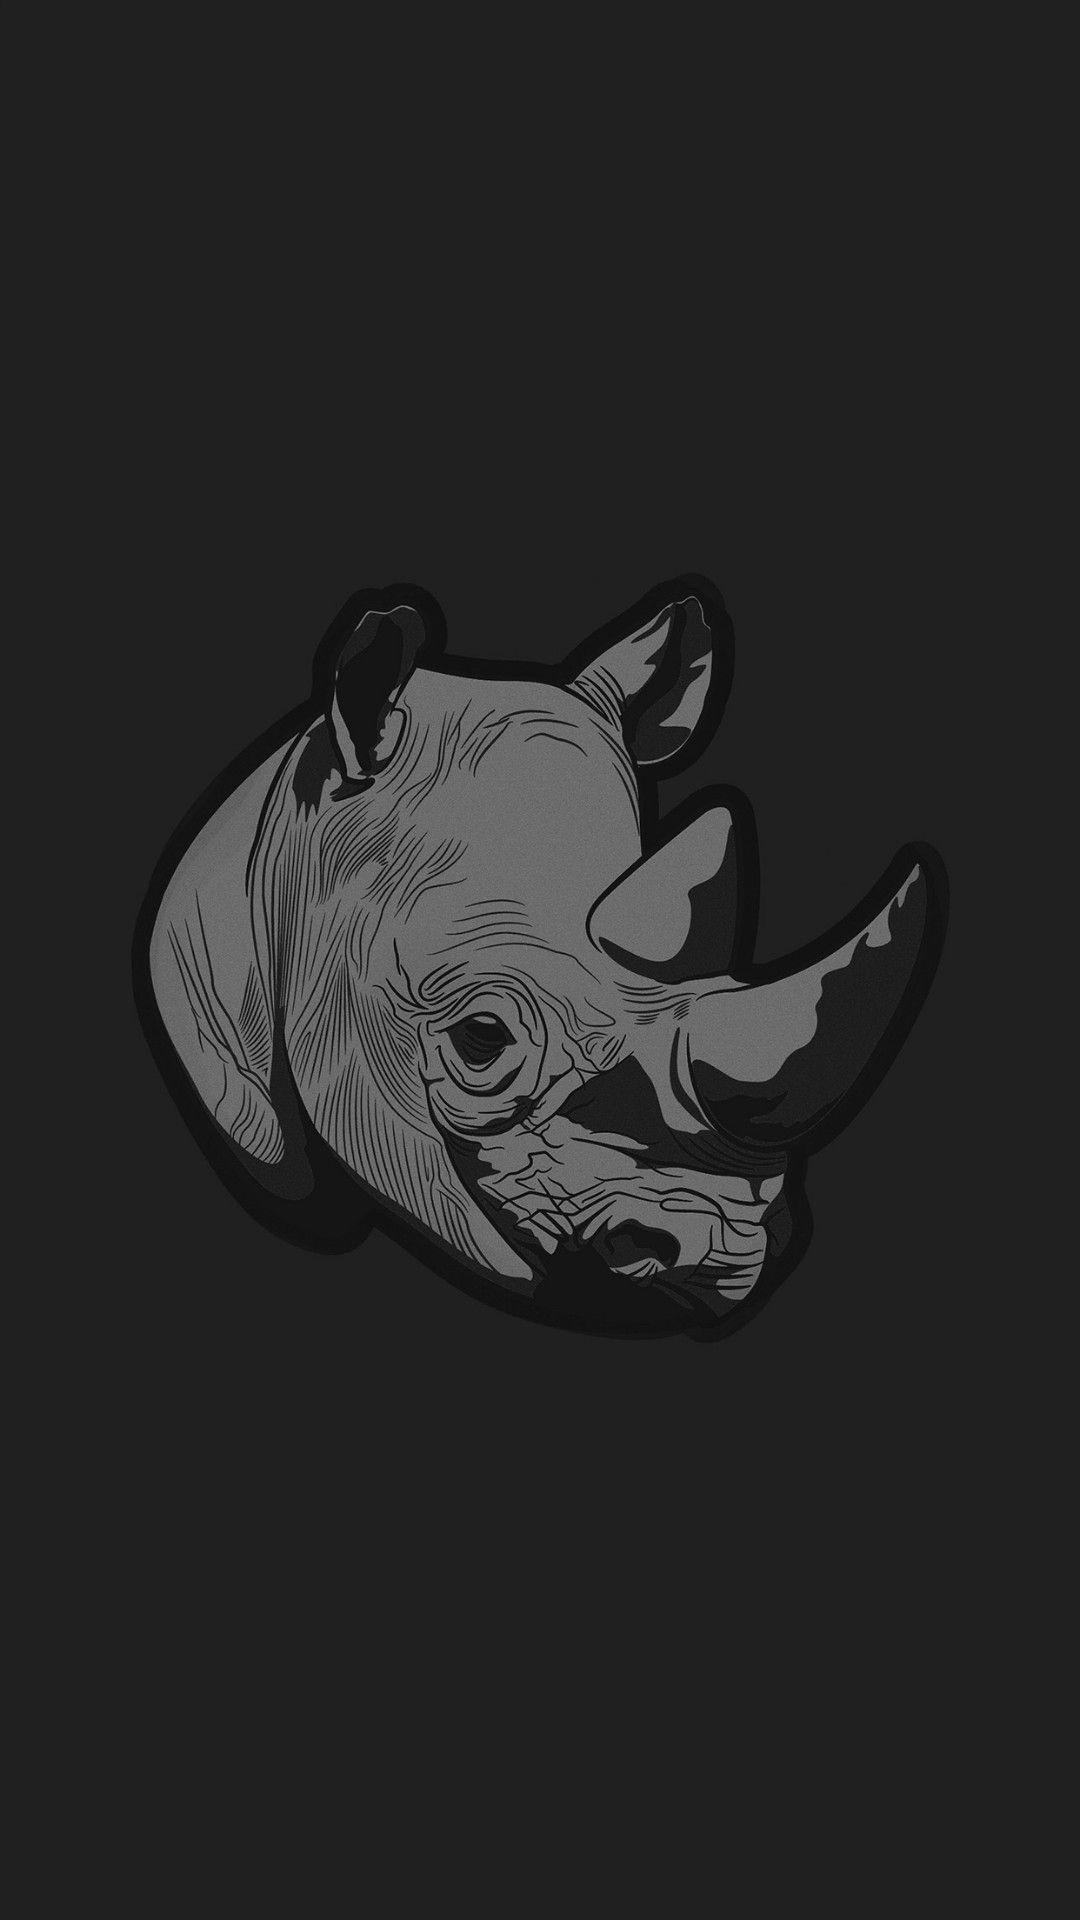 Wallpaper iphone art hd - Thoughtful Rhino Dark Minimal Illust Art Iphone 6 Wallpaper